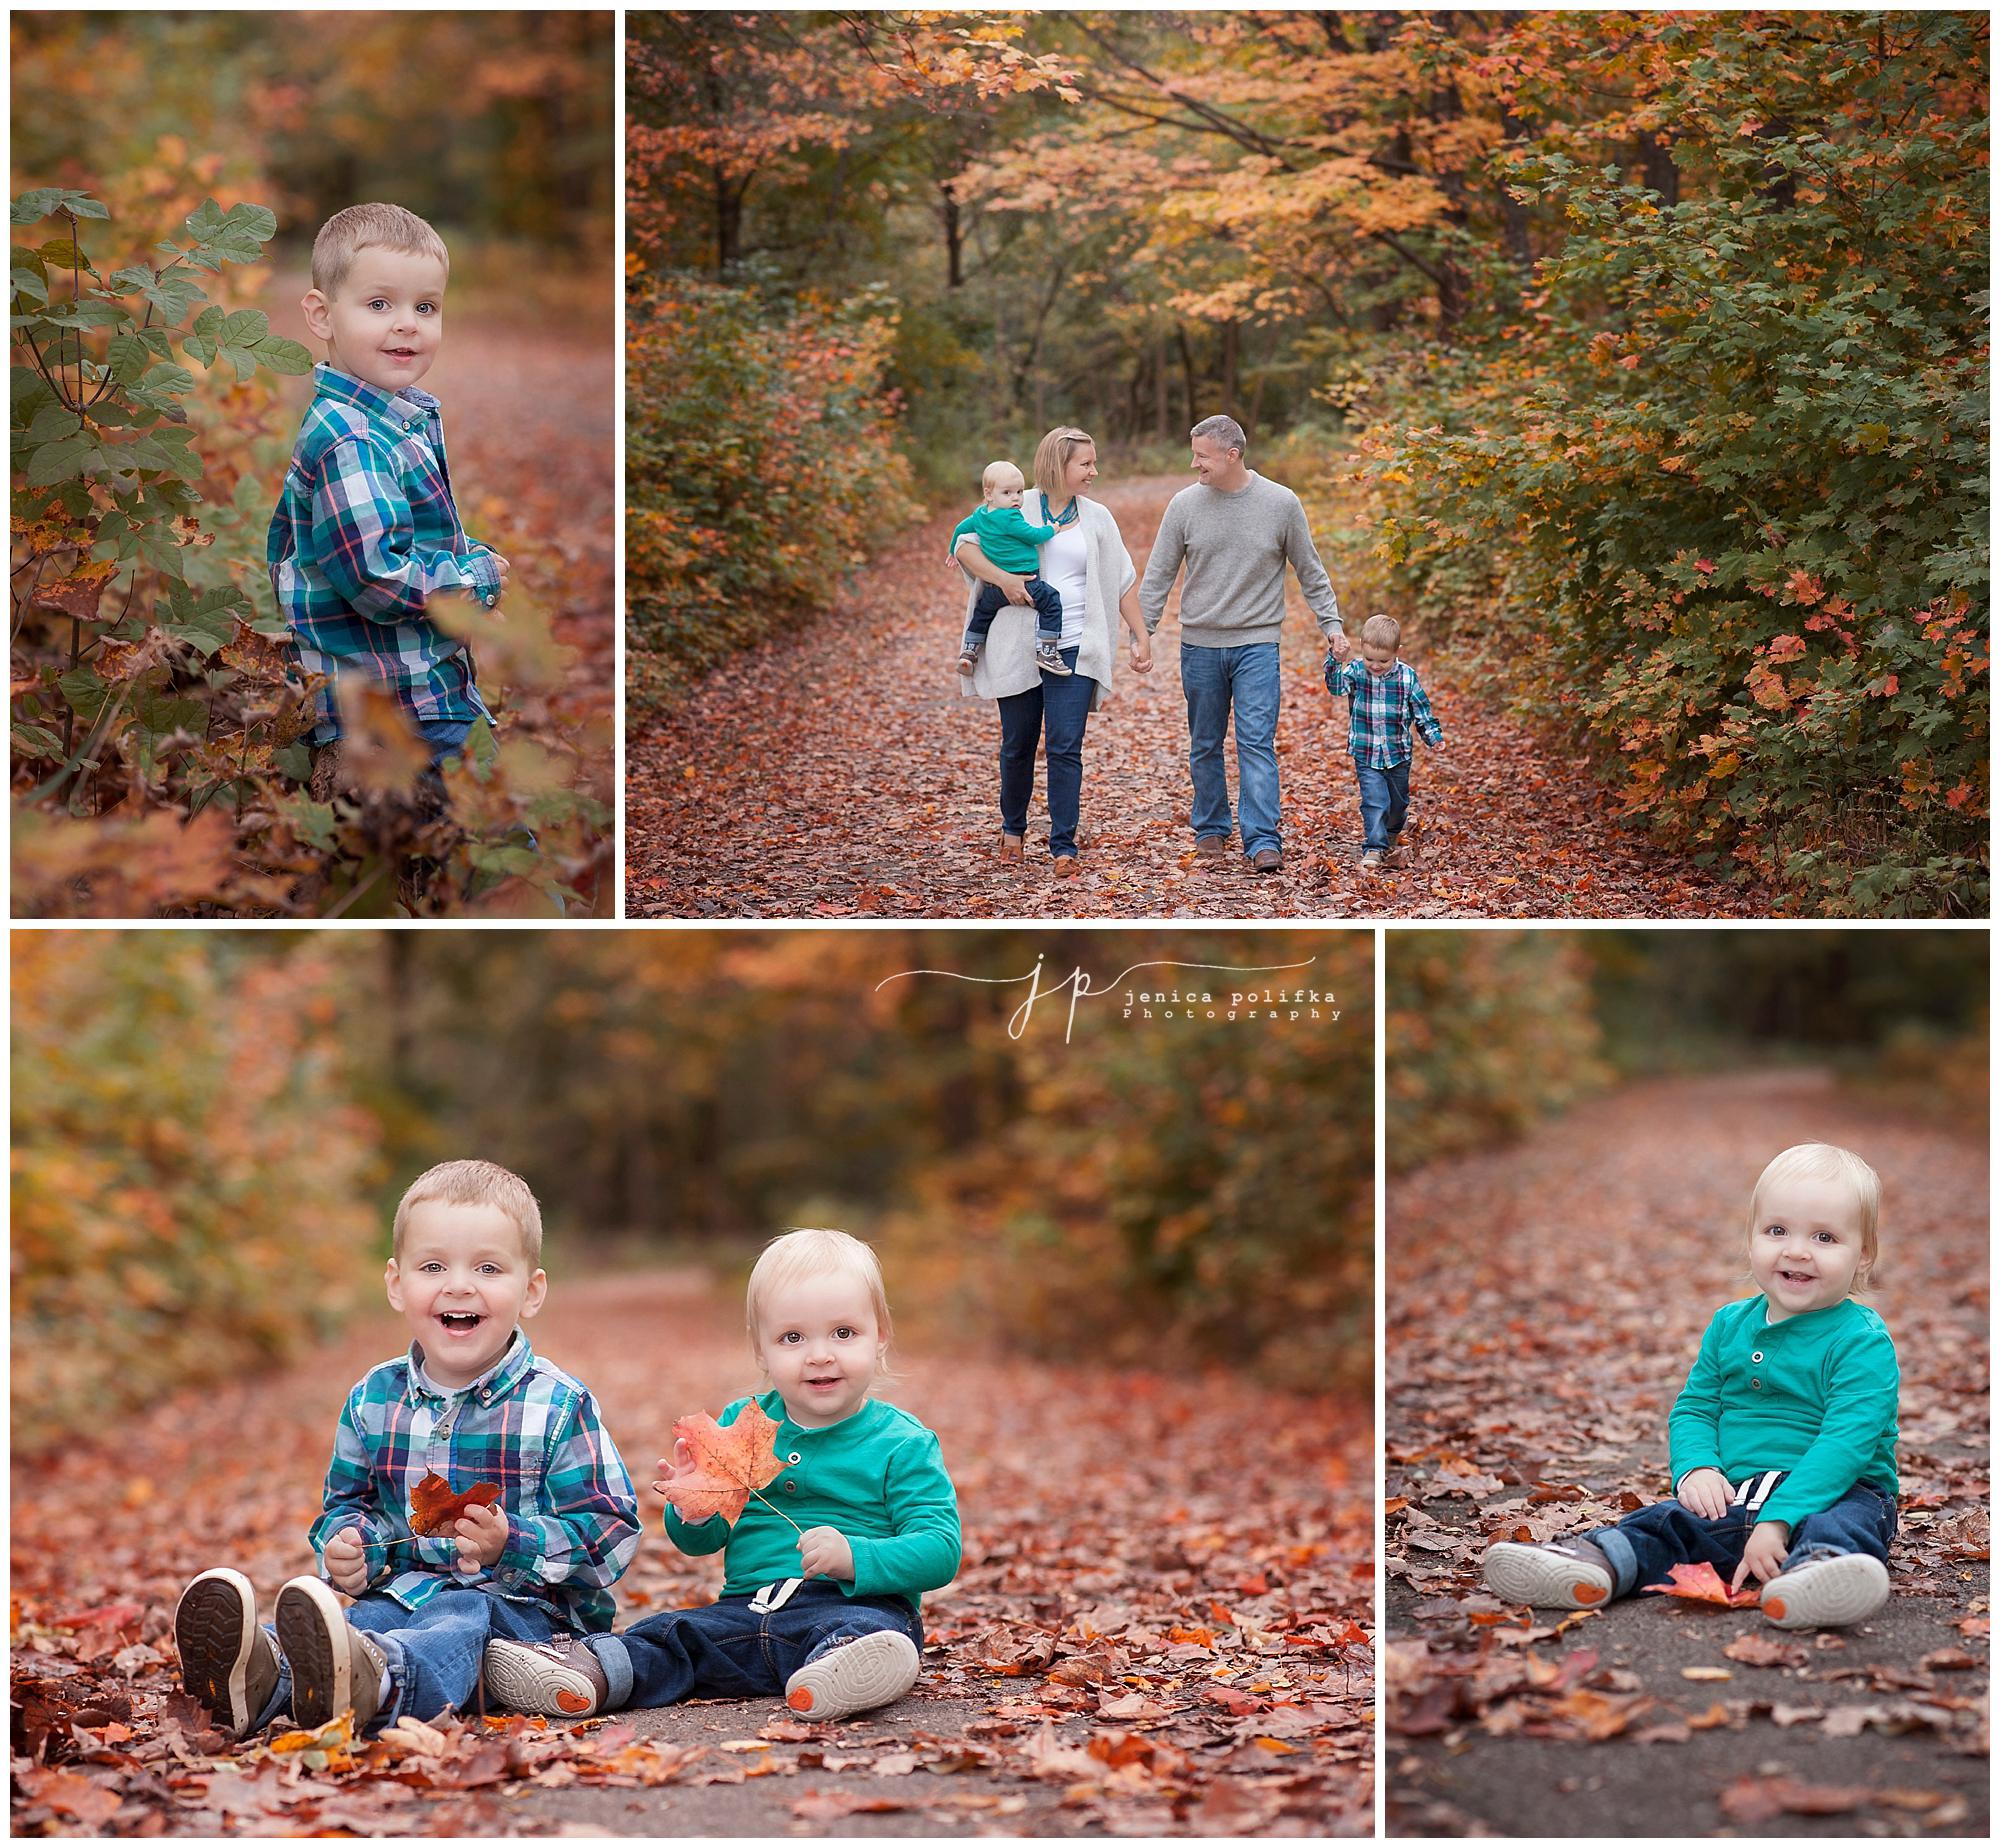 Arlington heights Illinois family photography